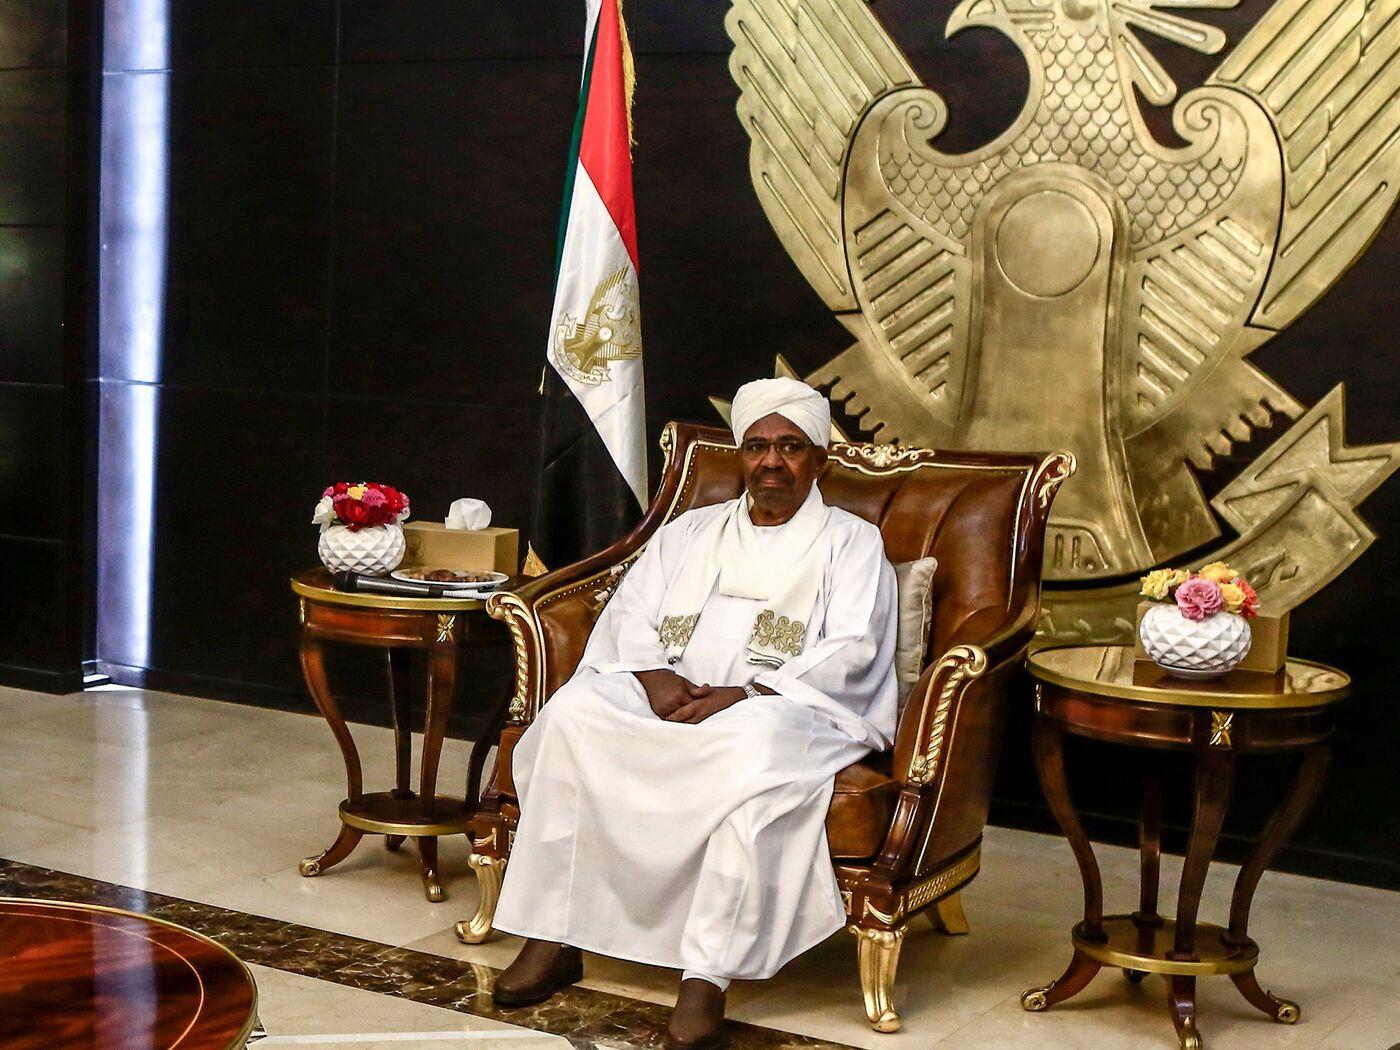 Omar al-Bashir in Khartoum in 2019.